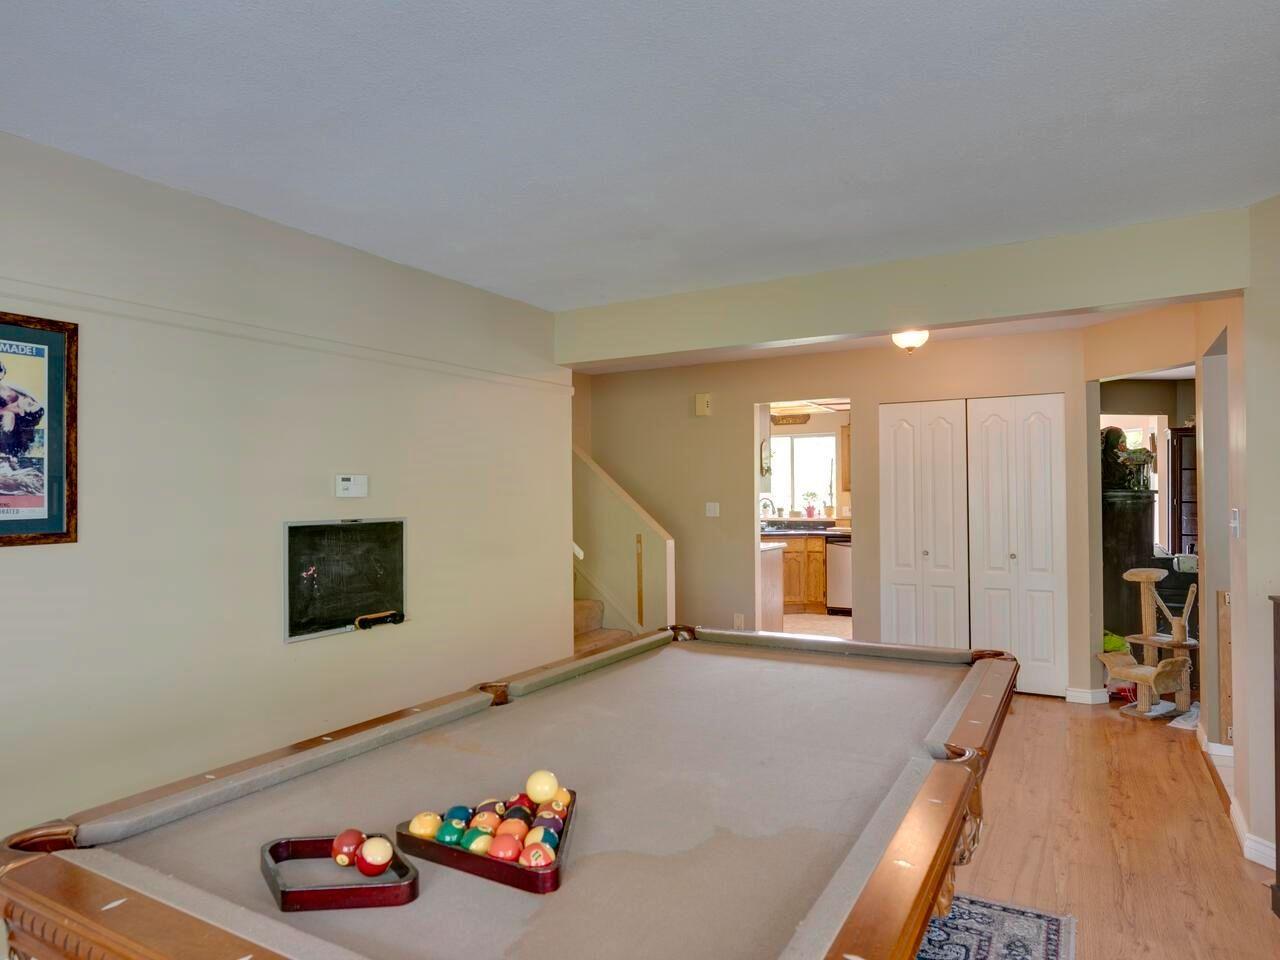 "Photo 7: Photos: 21374 RIVER Road in Maple Ridge: Southwest Maple Ridge House for sale in ""River Road"" : MLS®# R2600142"